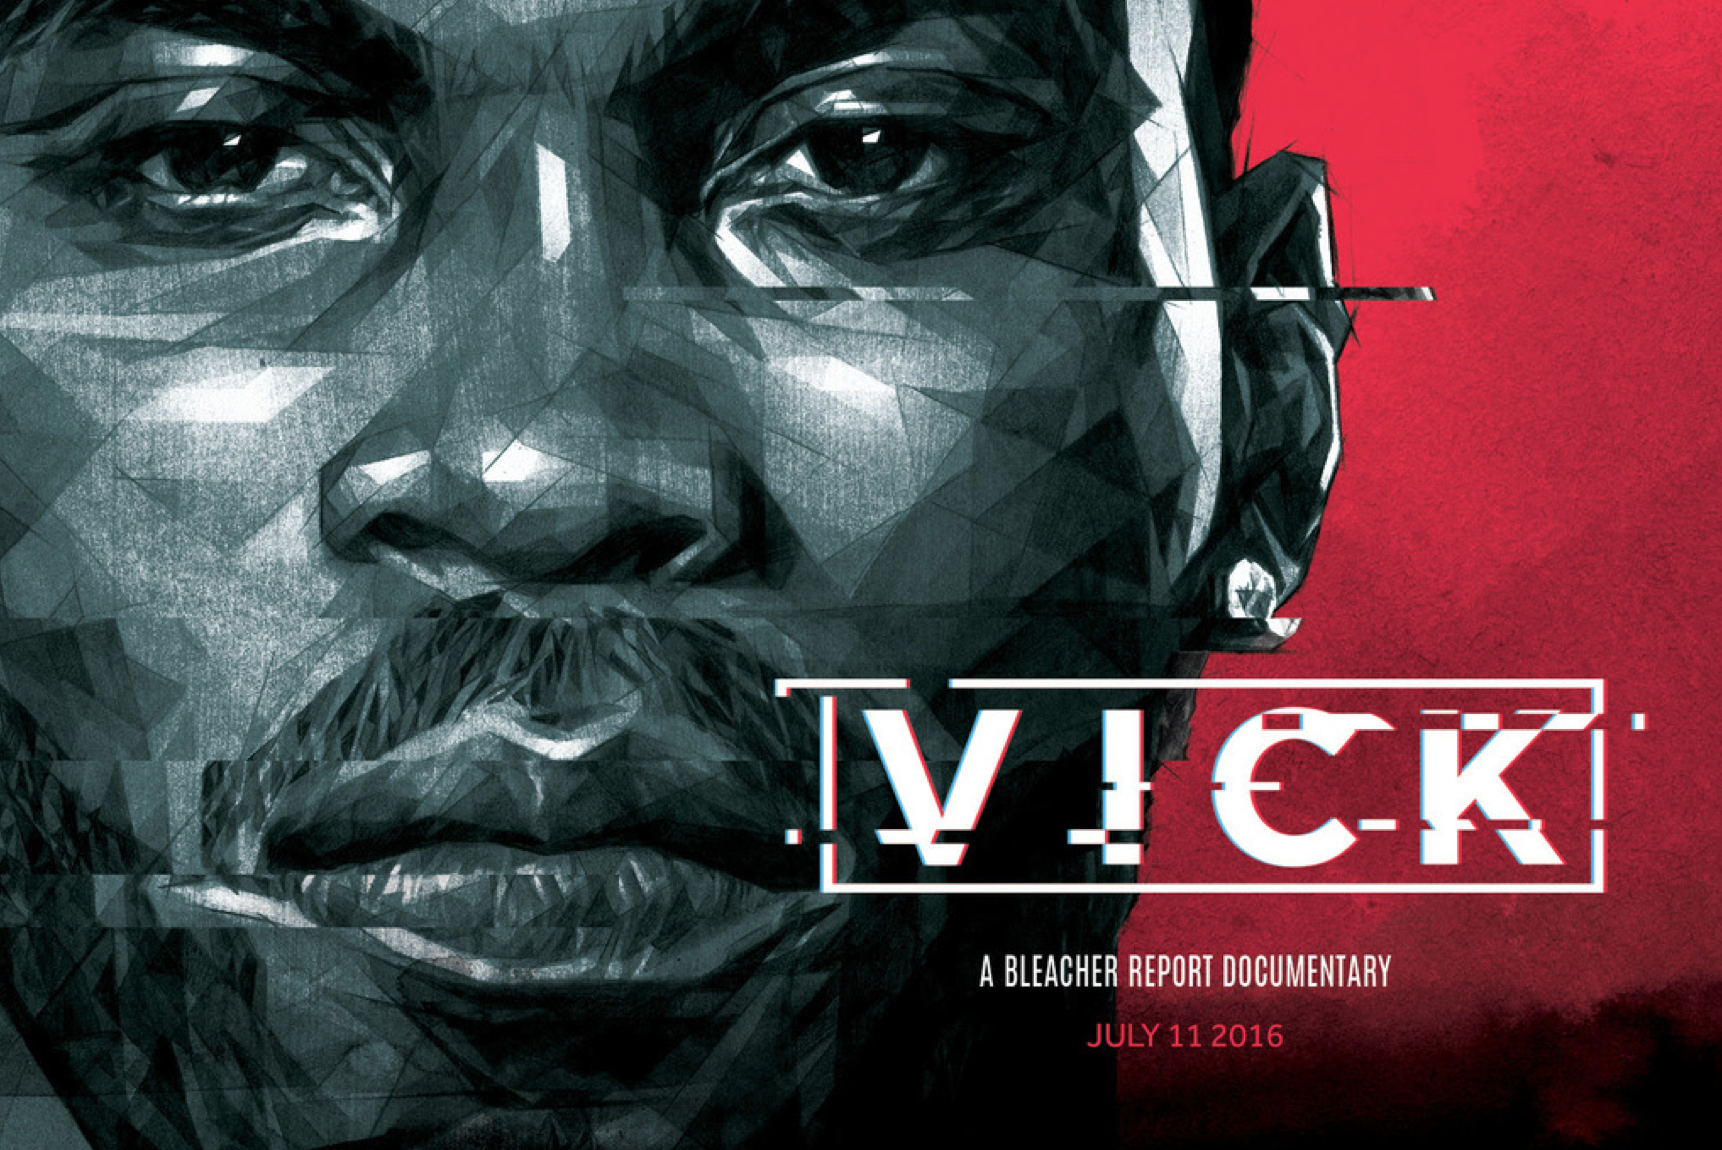 Michael Vick Bleacher Report